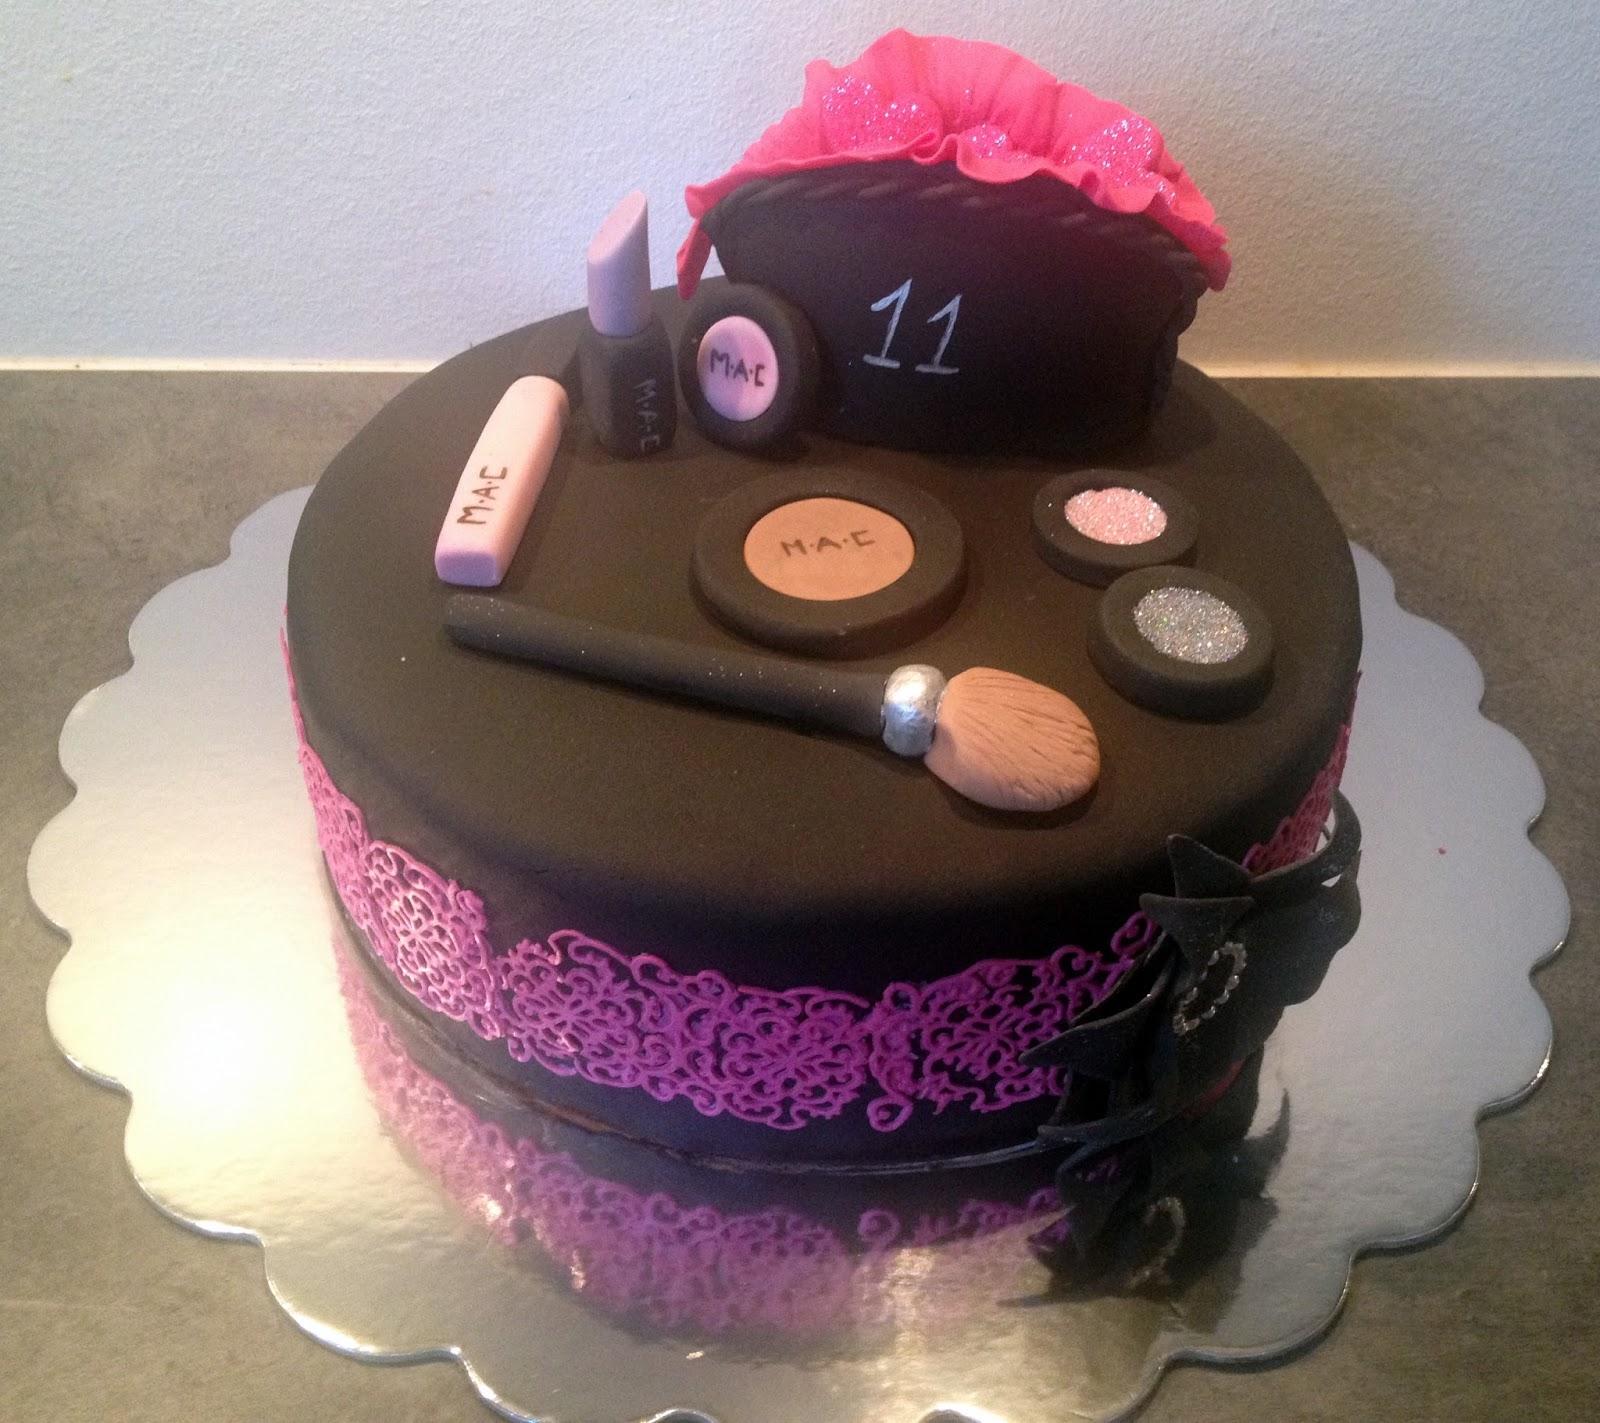 en kage